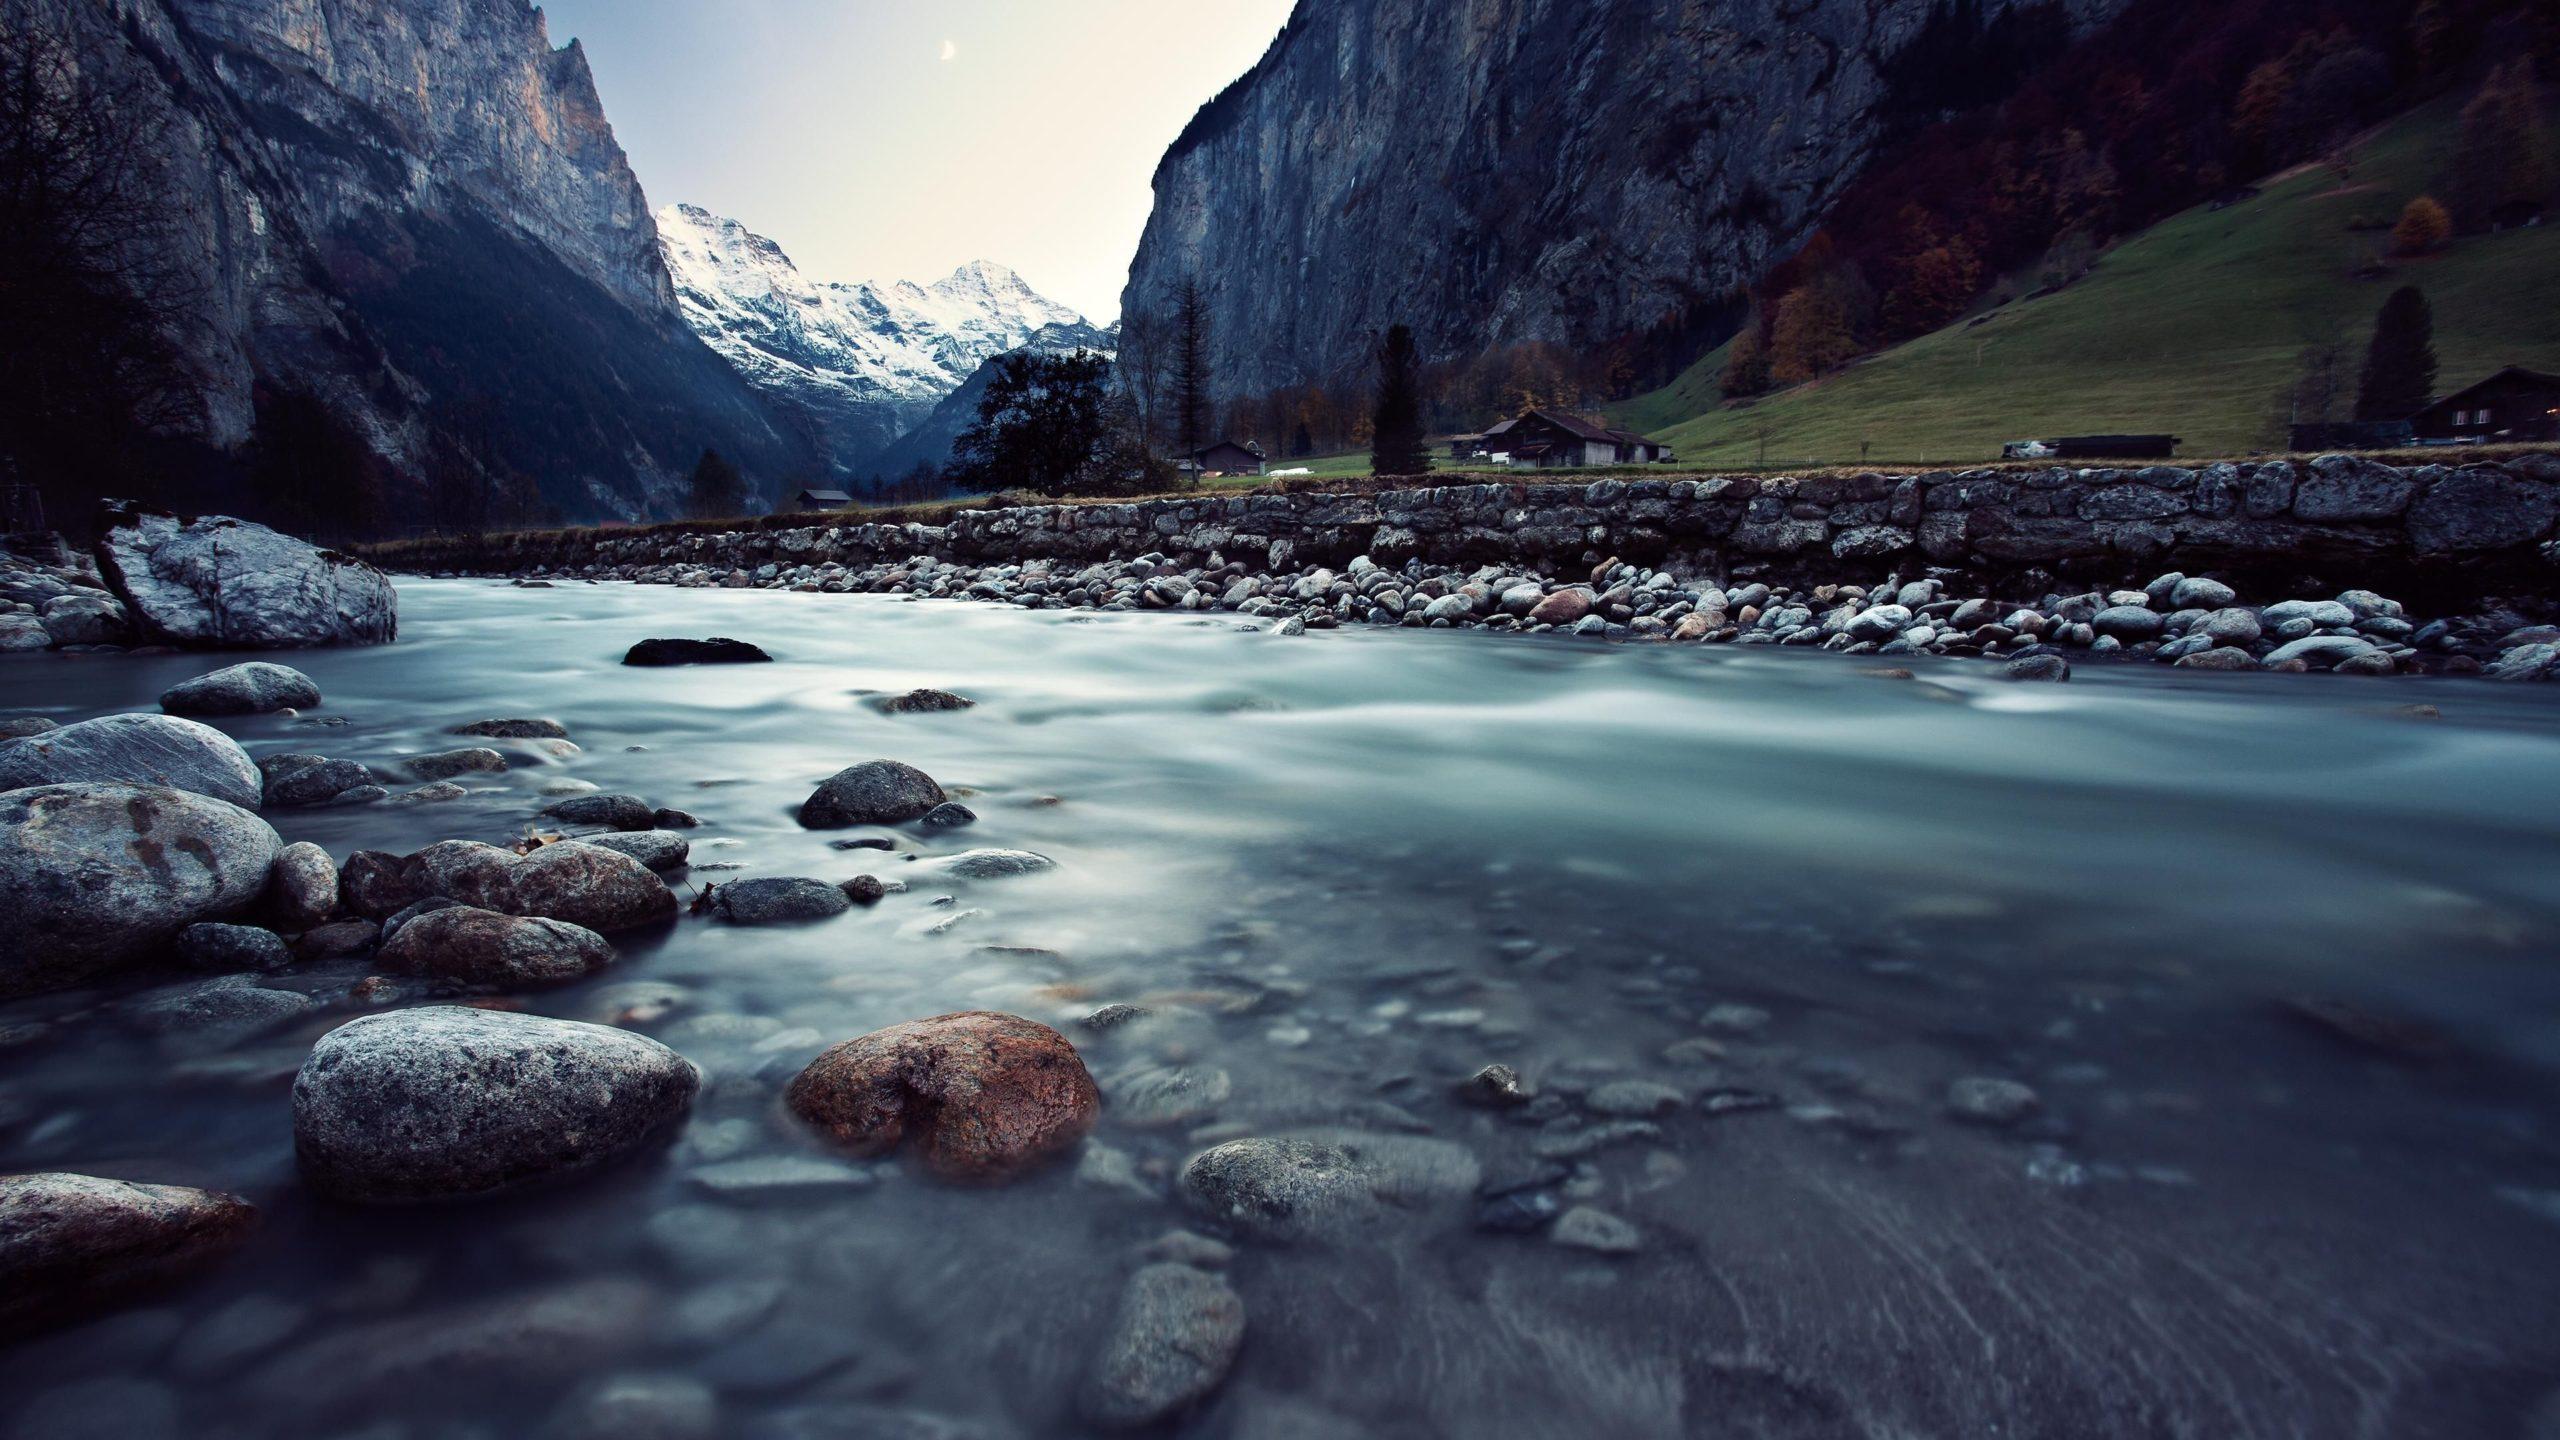 switzerland mountains photos